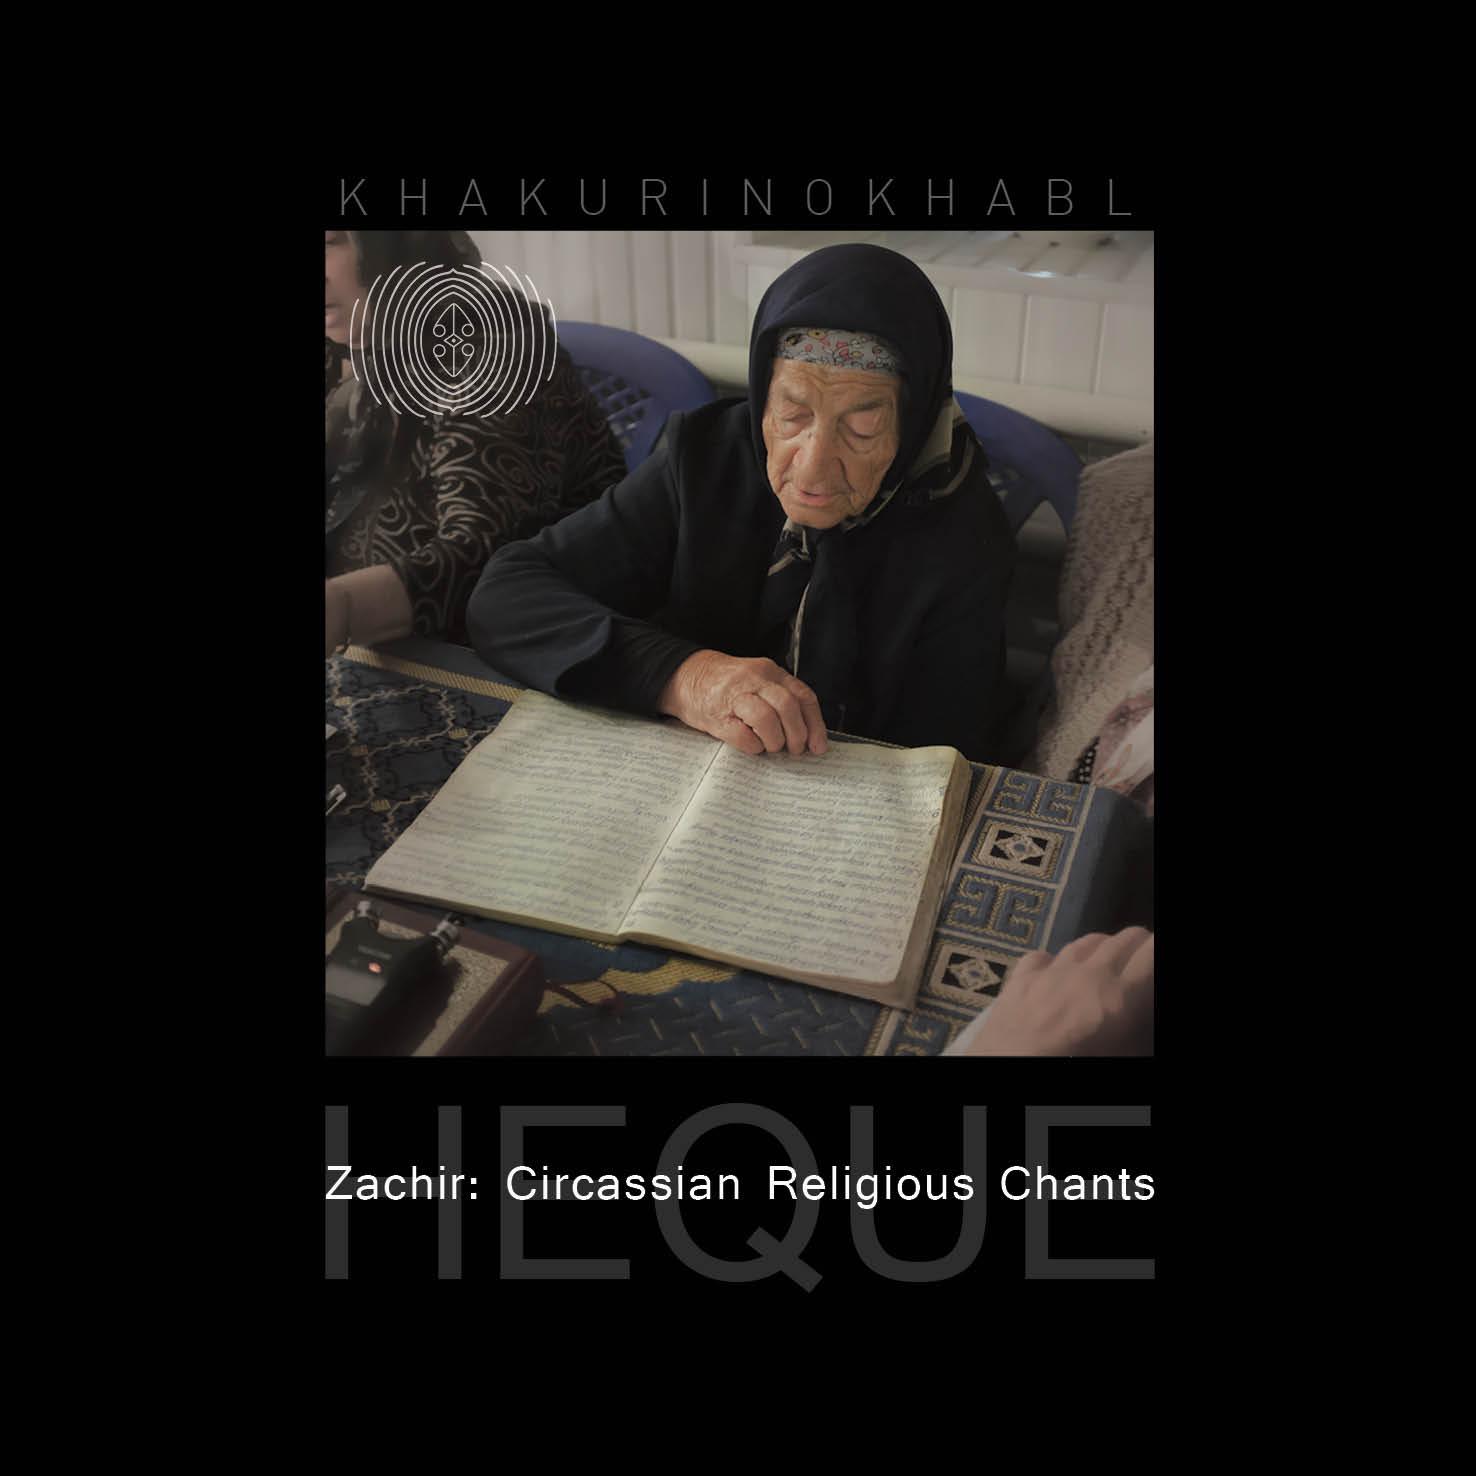 https://oredrecordings.bandcamp.com/album/khakurinokhabl-zachir-circassian-religious-chants